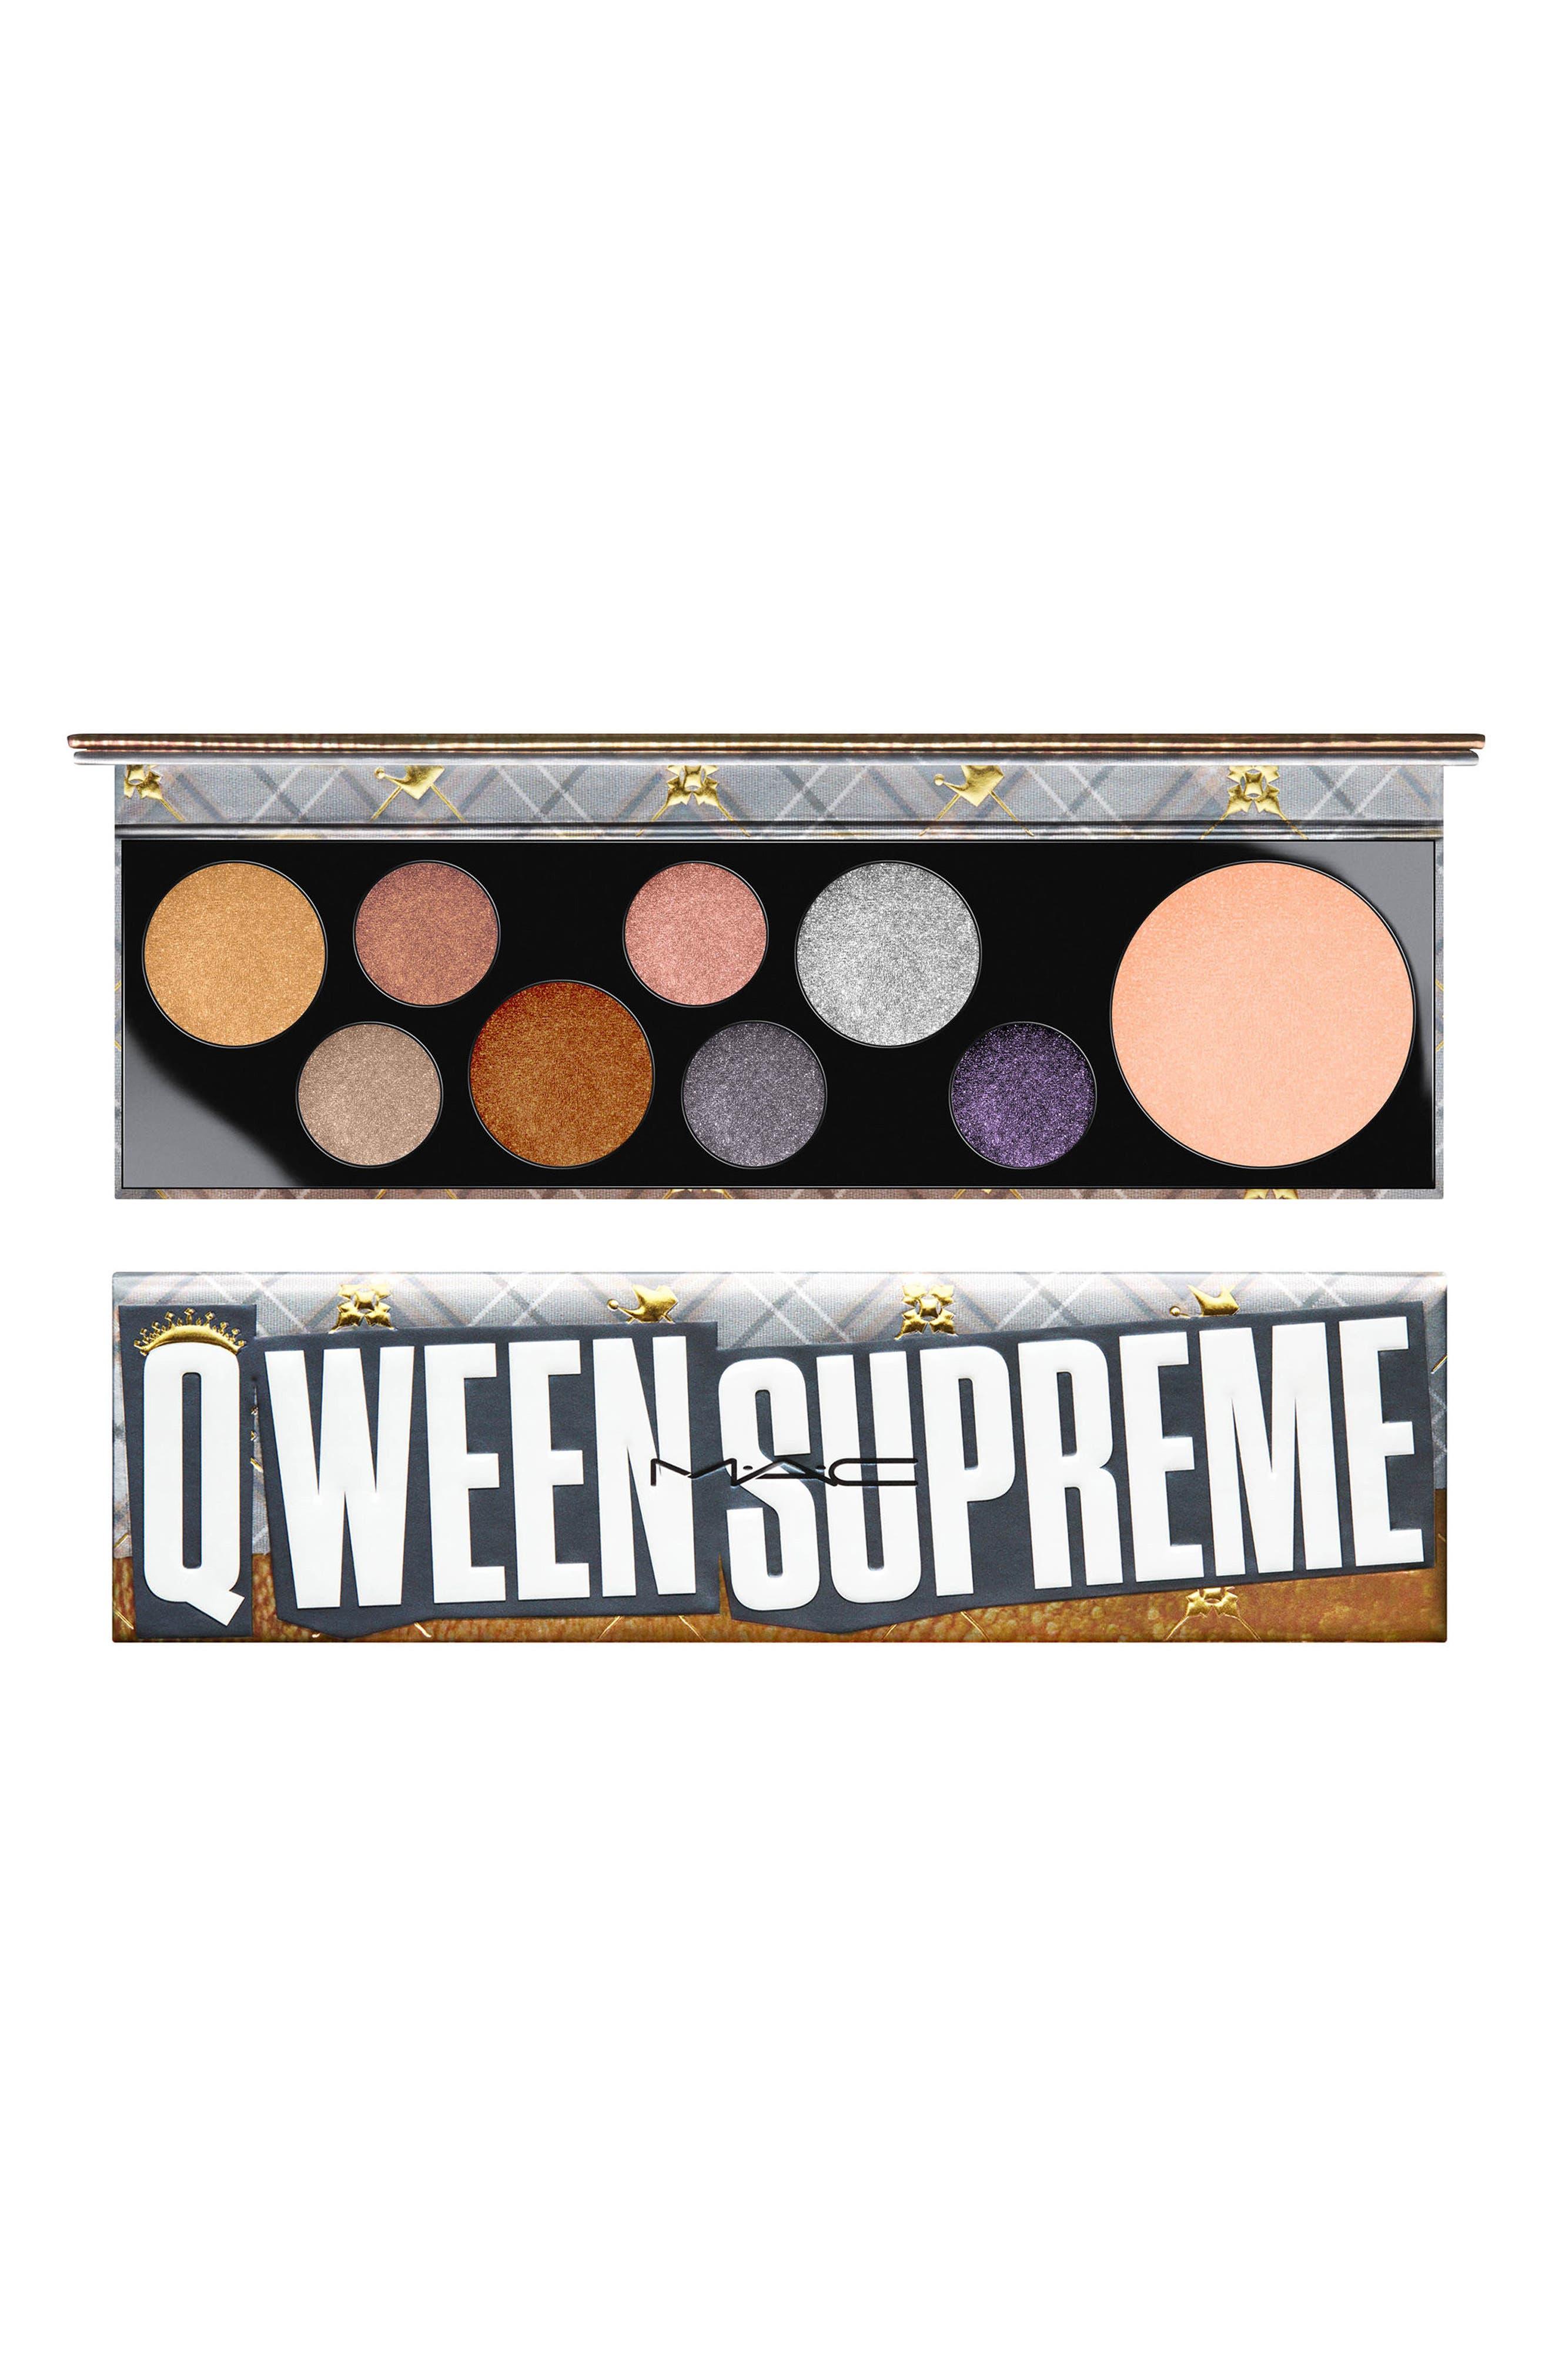 MAC Girls Qween Supreme Palette ($160 Value)